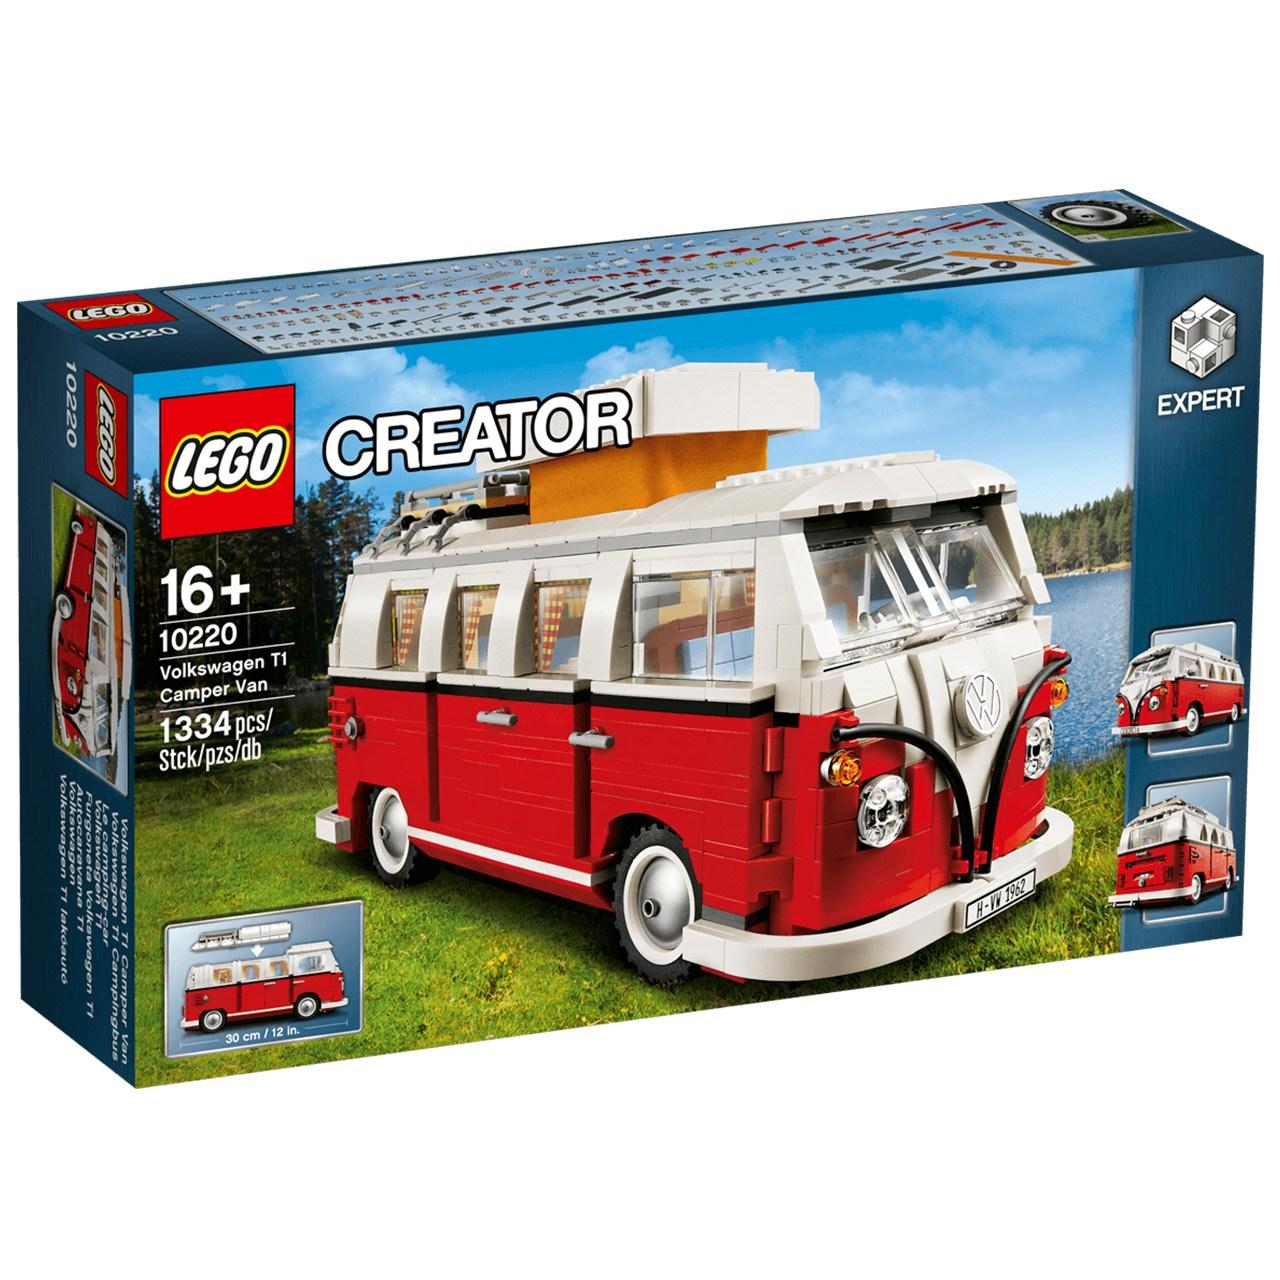 لگو سری Creator مدل Volkswagen T1 Camper Van 10220 Lego